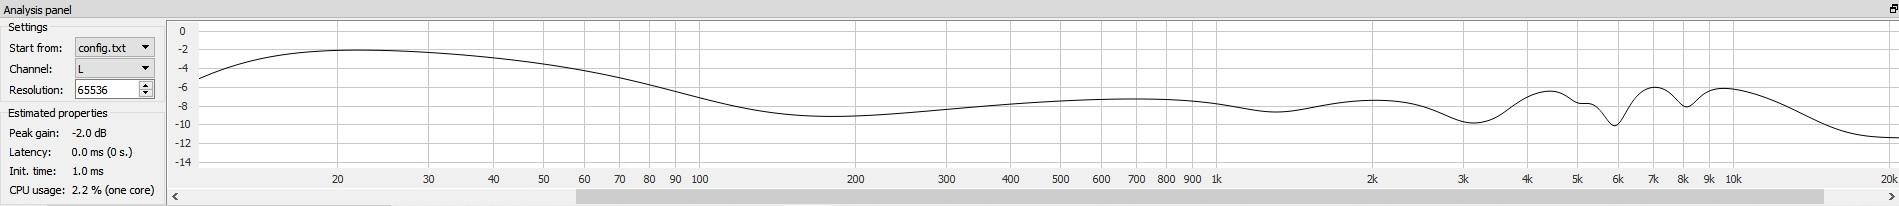 HD600 Analysis Panel Oratory.jpg